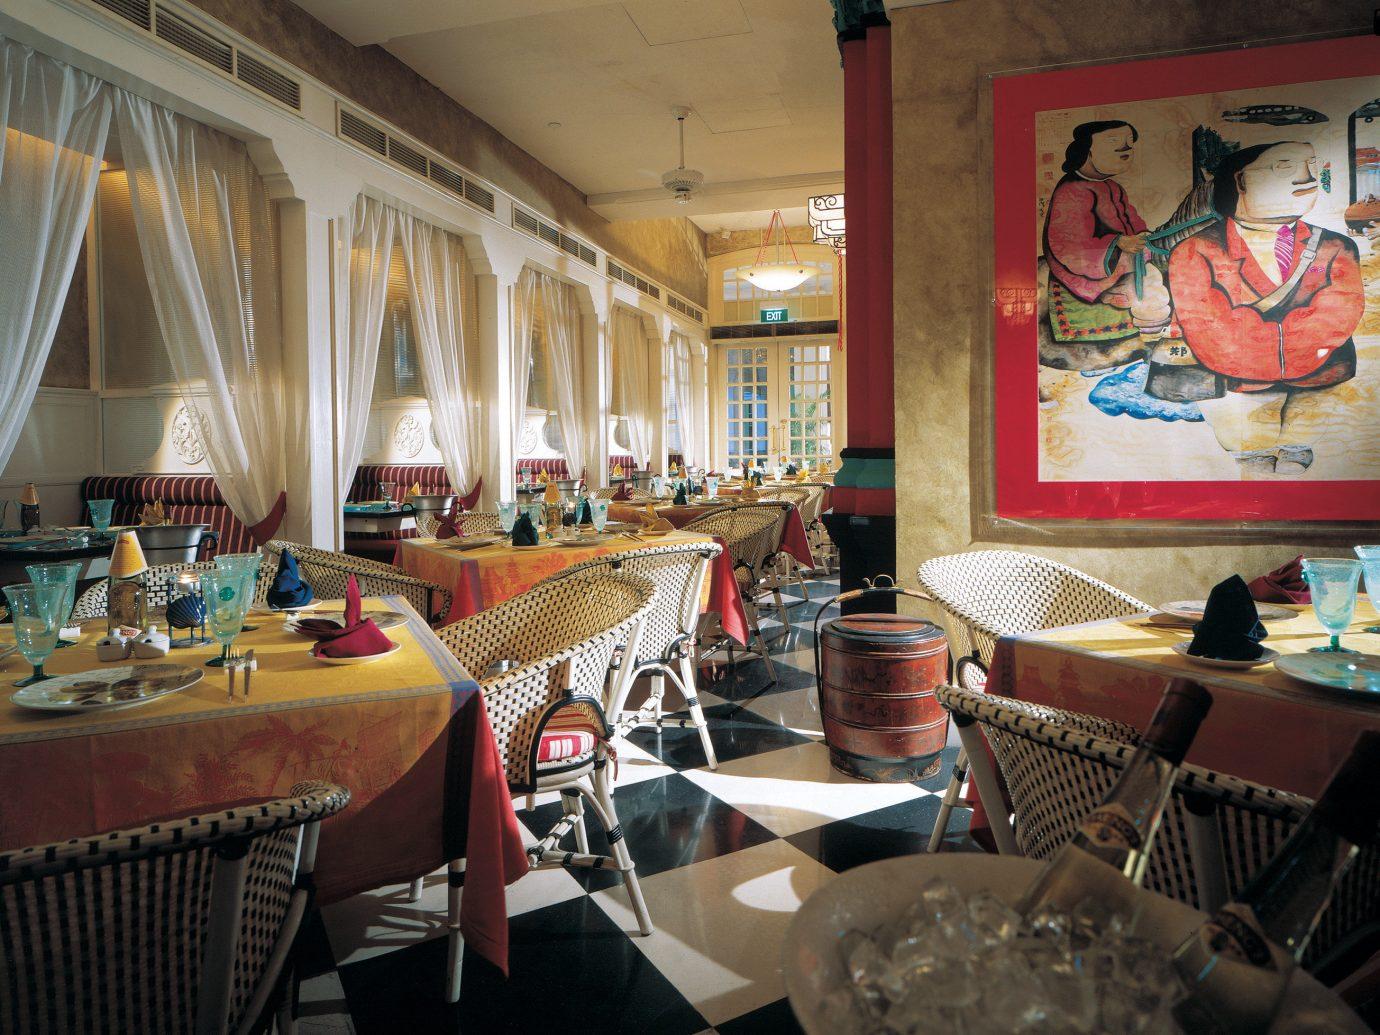 Bar Dining Drink Eat Elegant Hotels Luxury Romantic indoor restaurant meal interior design furniture cluttered